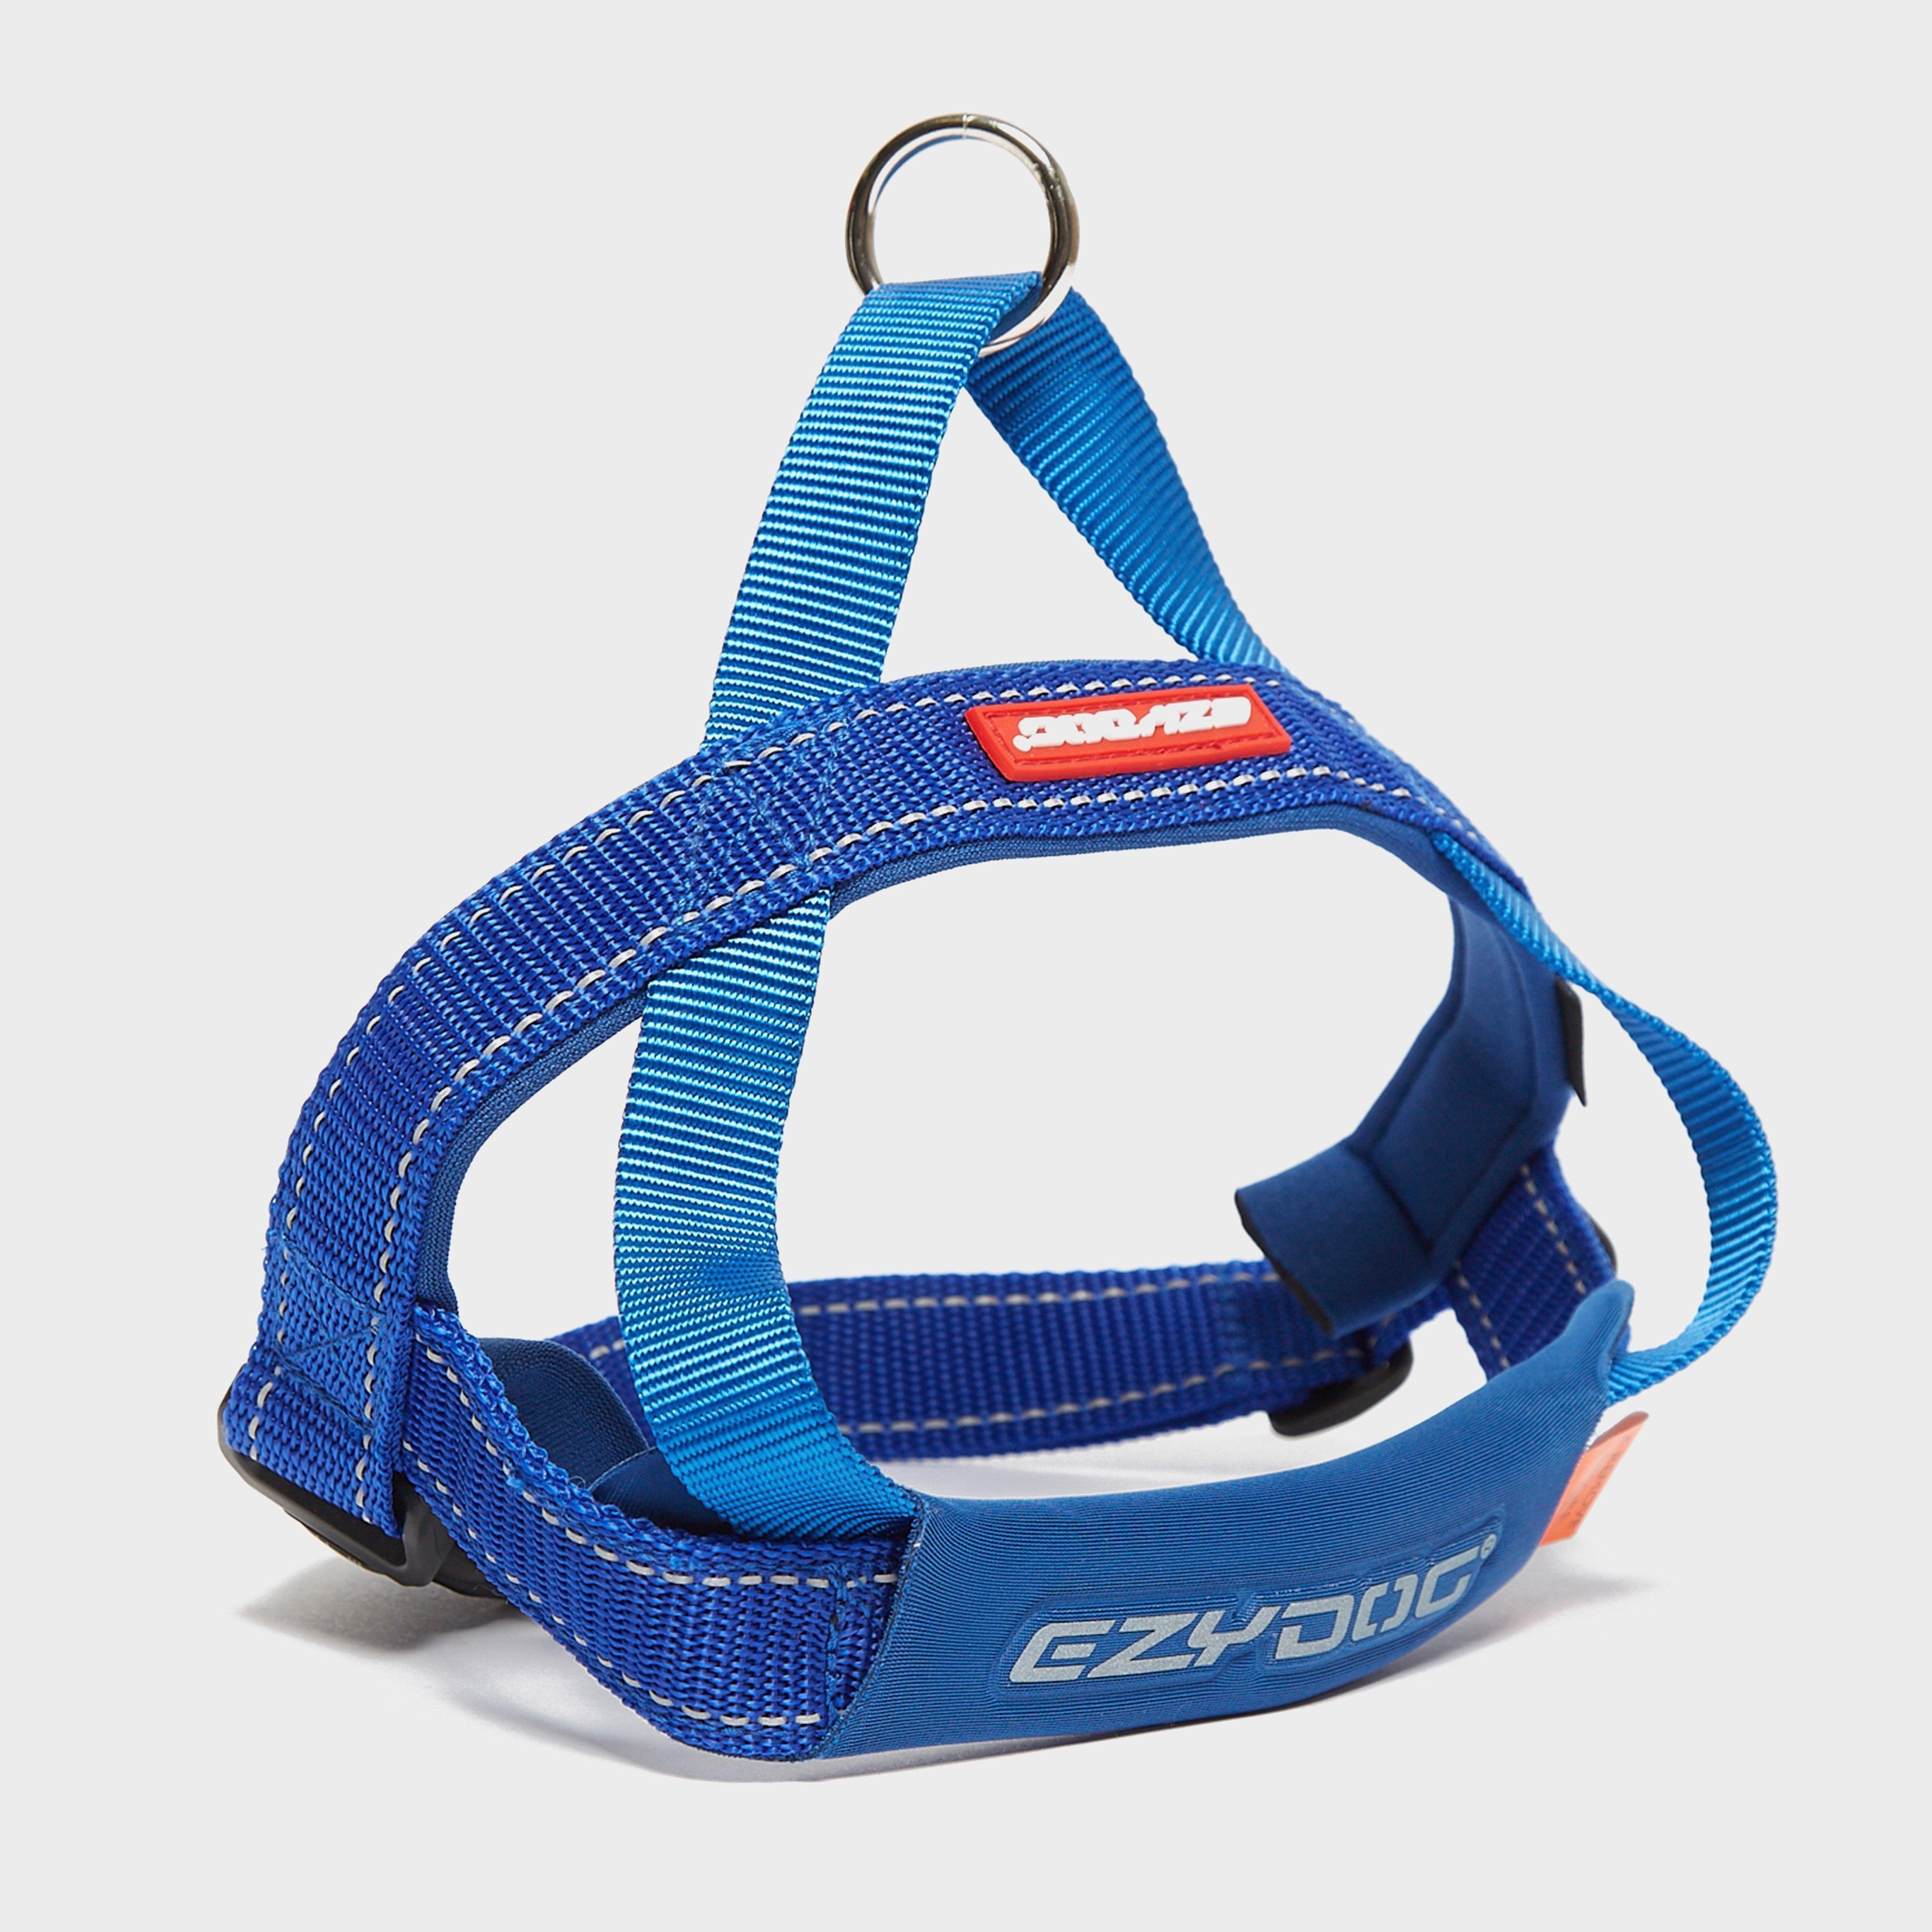 Image of Ezy-Dog Quick Fit Harness (Medium) - Blue/Mbl, Blue/MBL